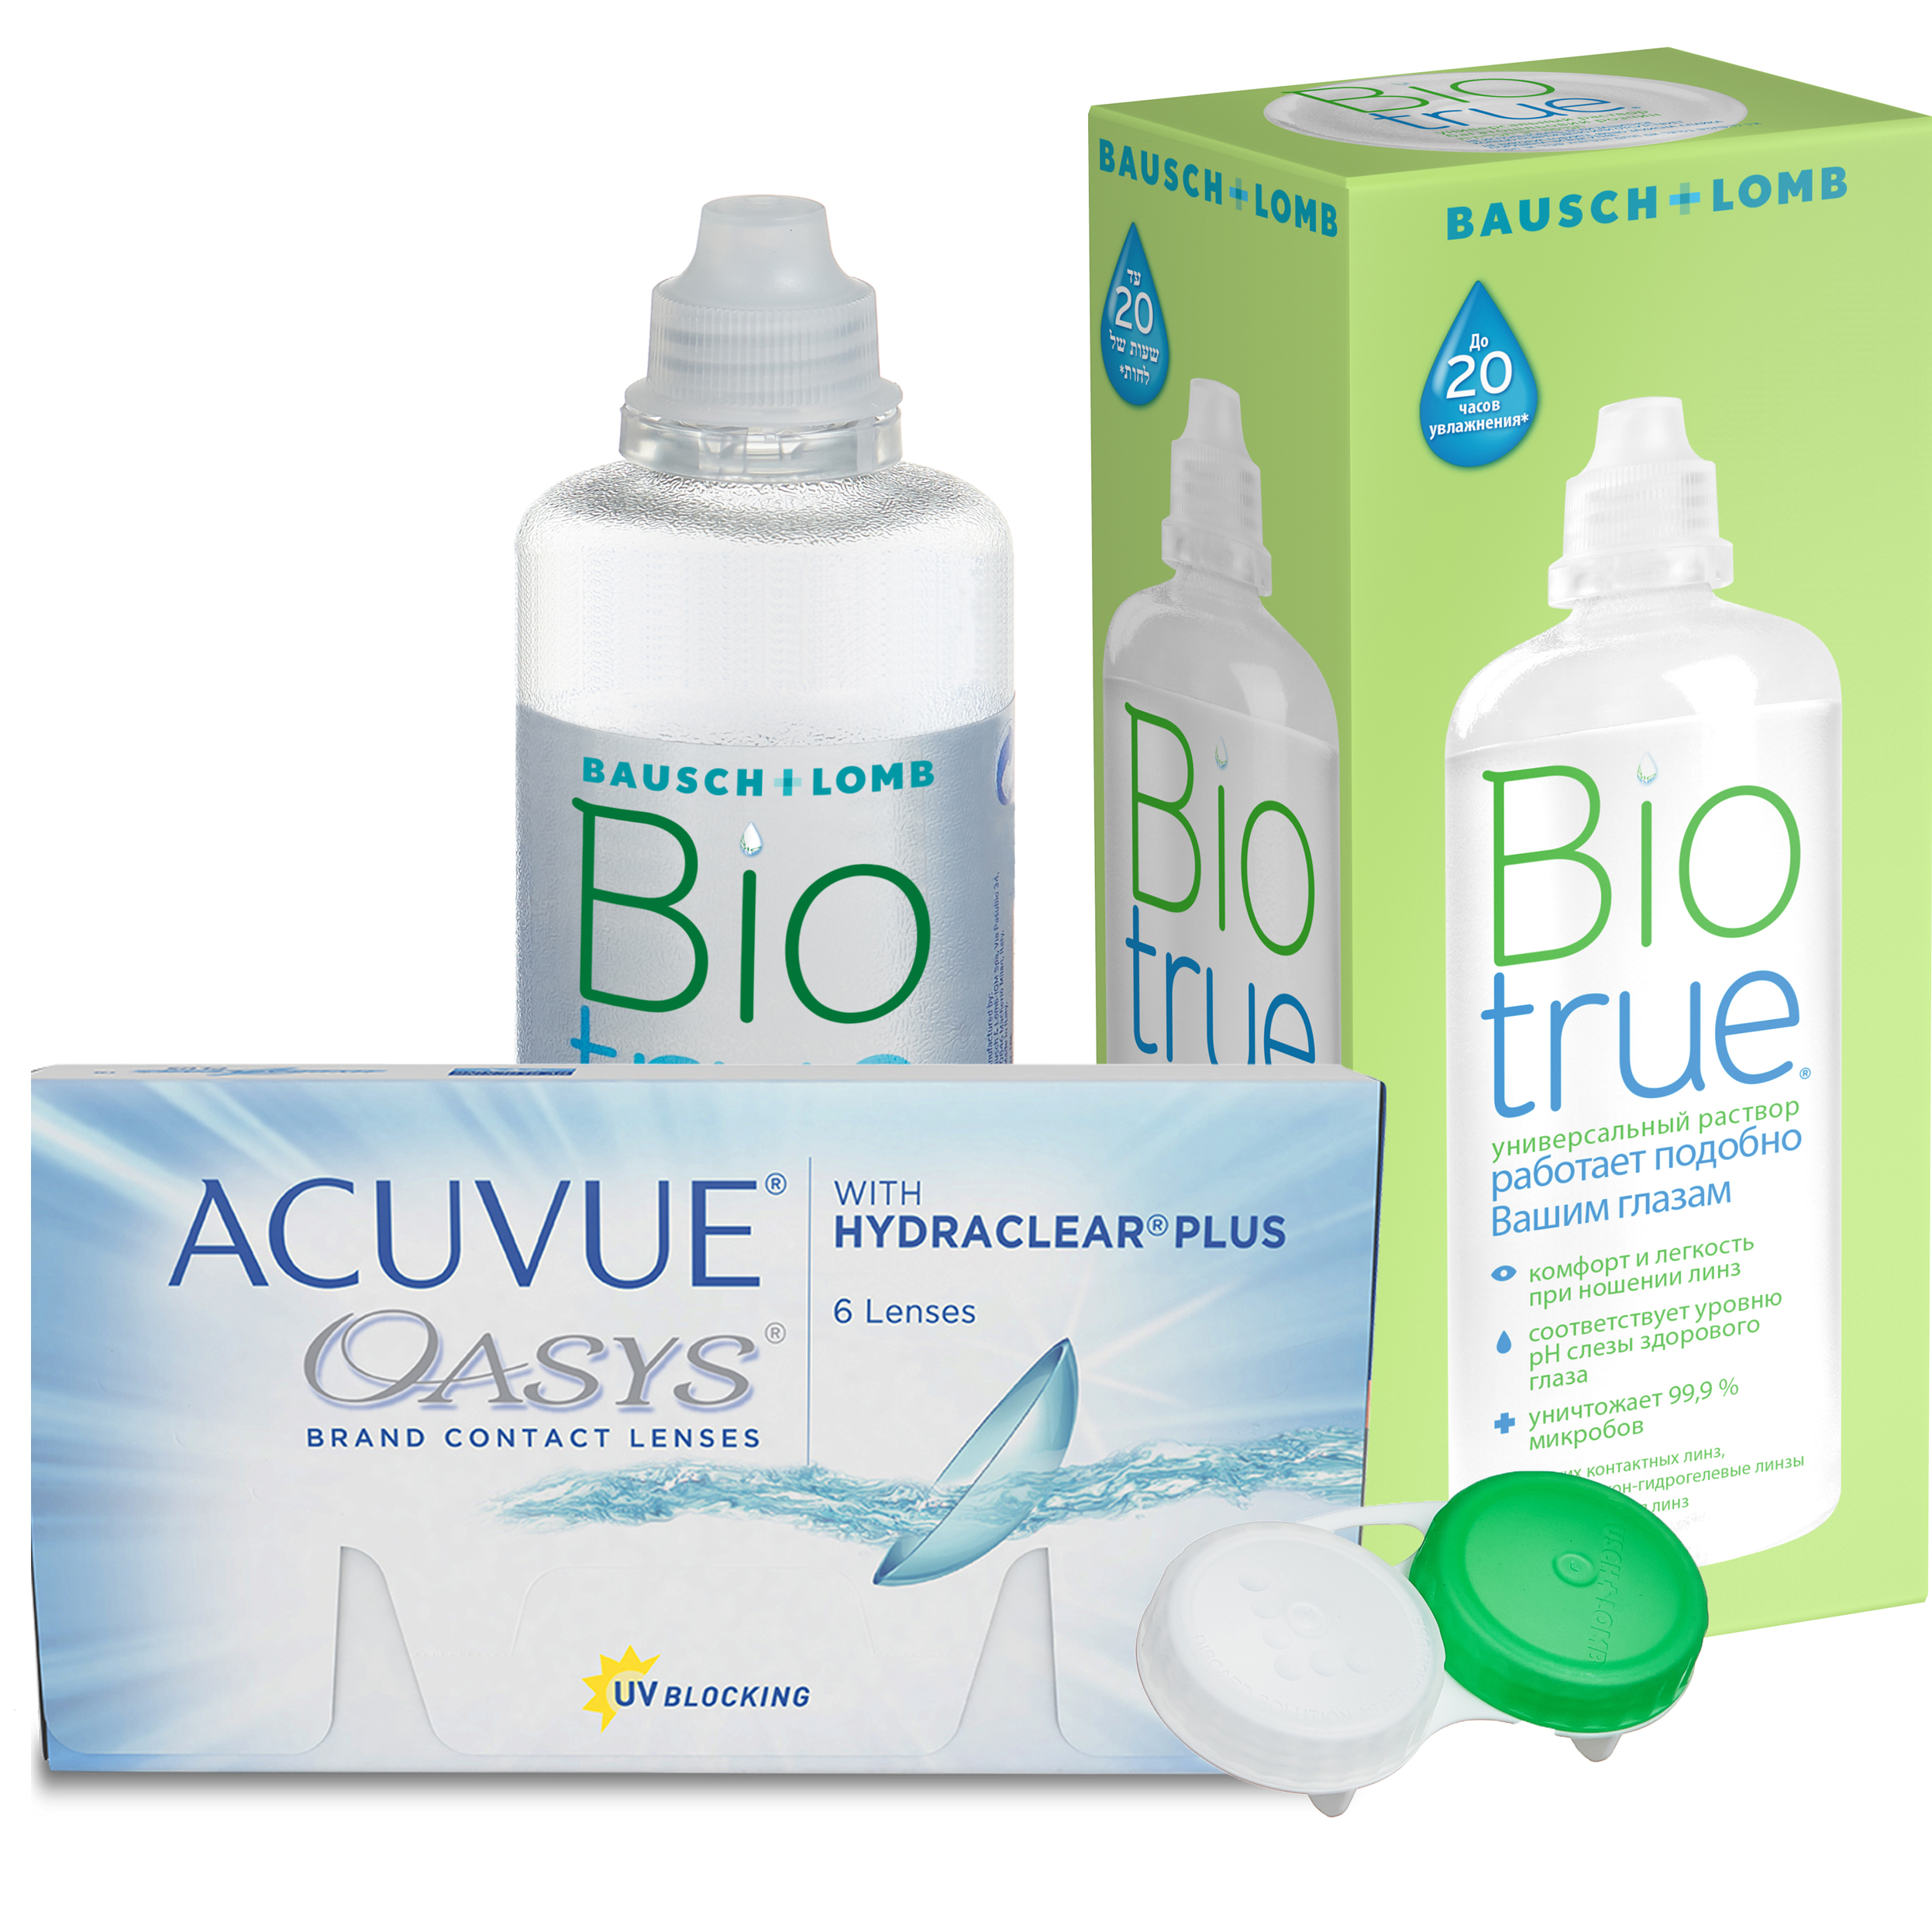 Купить Oasys with Hydraclear Plus 6 линз + Biotrue, Контактные линзы Acuvue Oasys with Hydraclear Plus 6 линз R 8.8 -12, 00 + Biotrue 300 мл